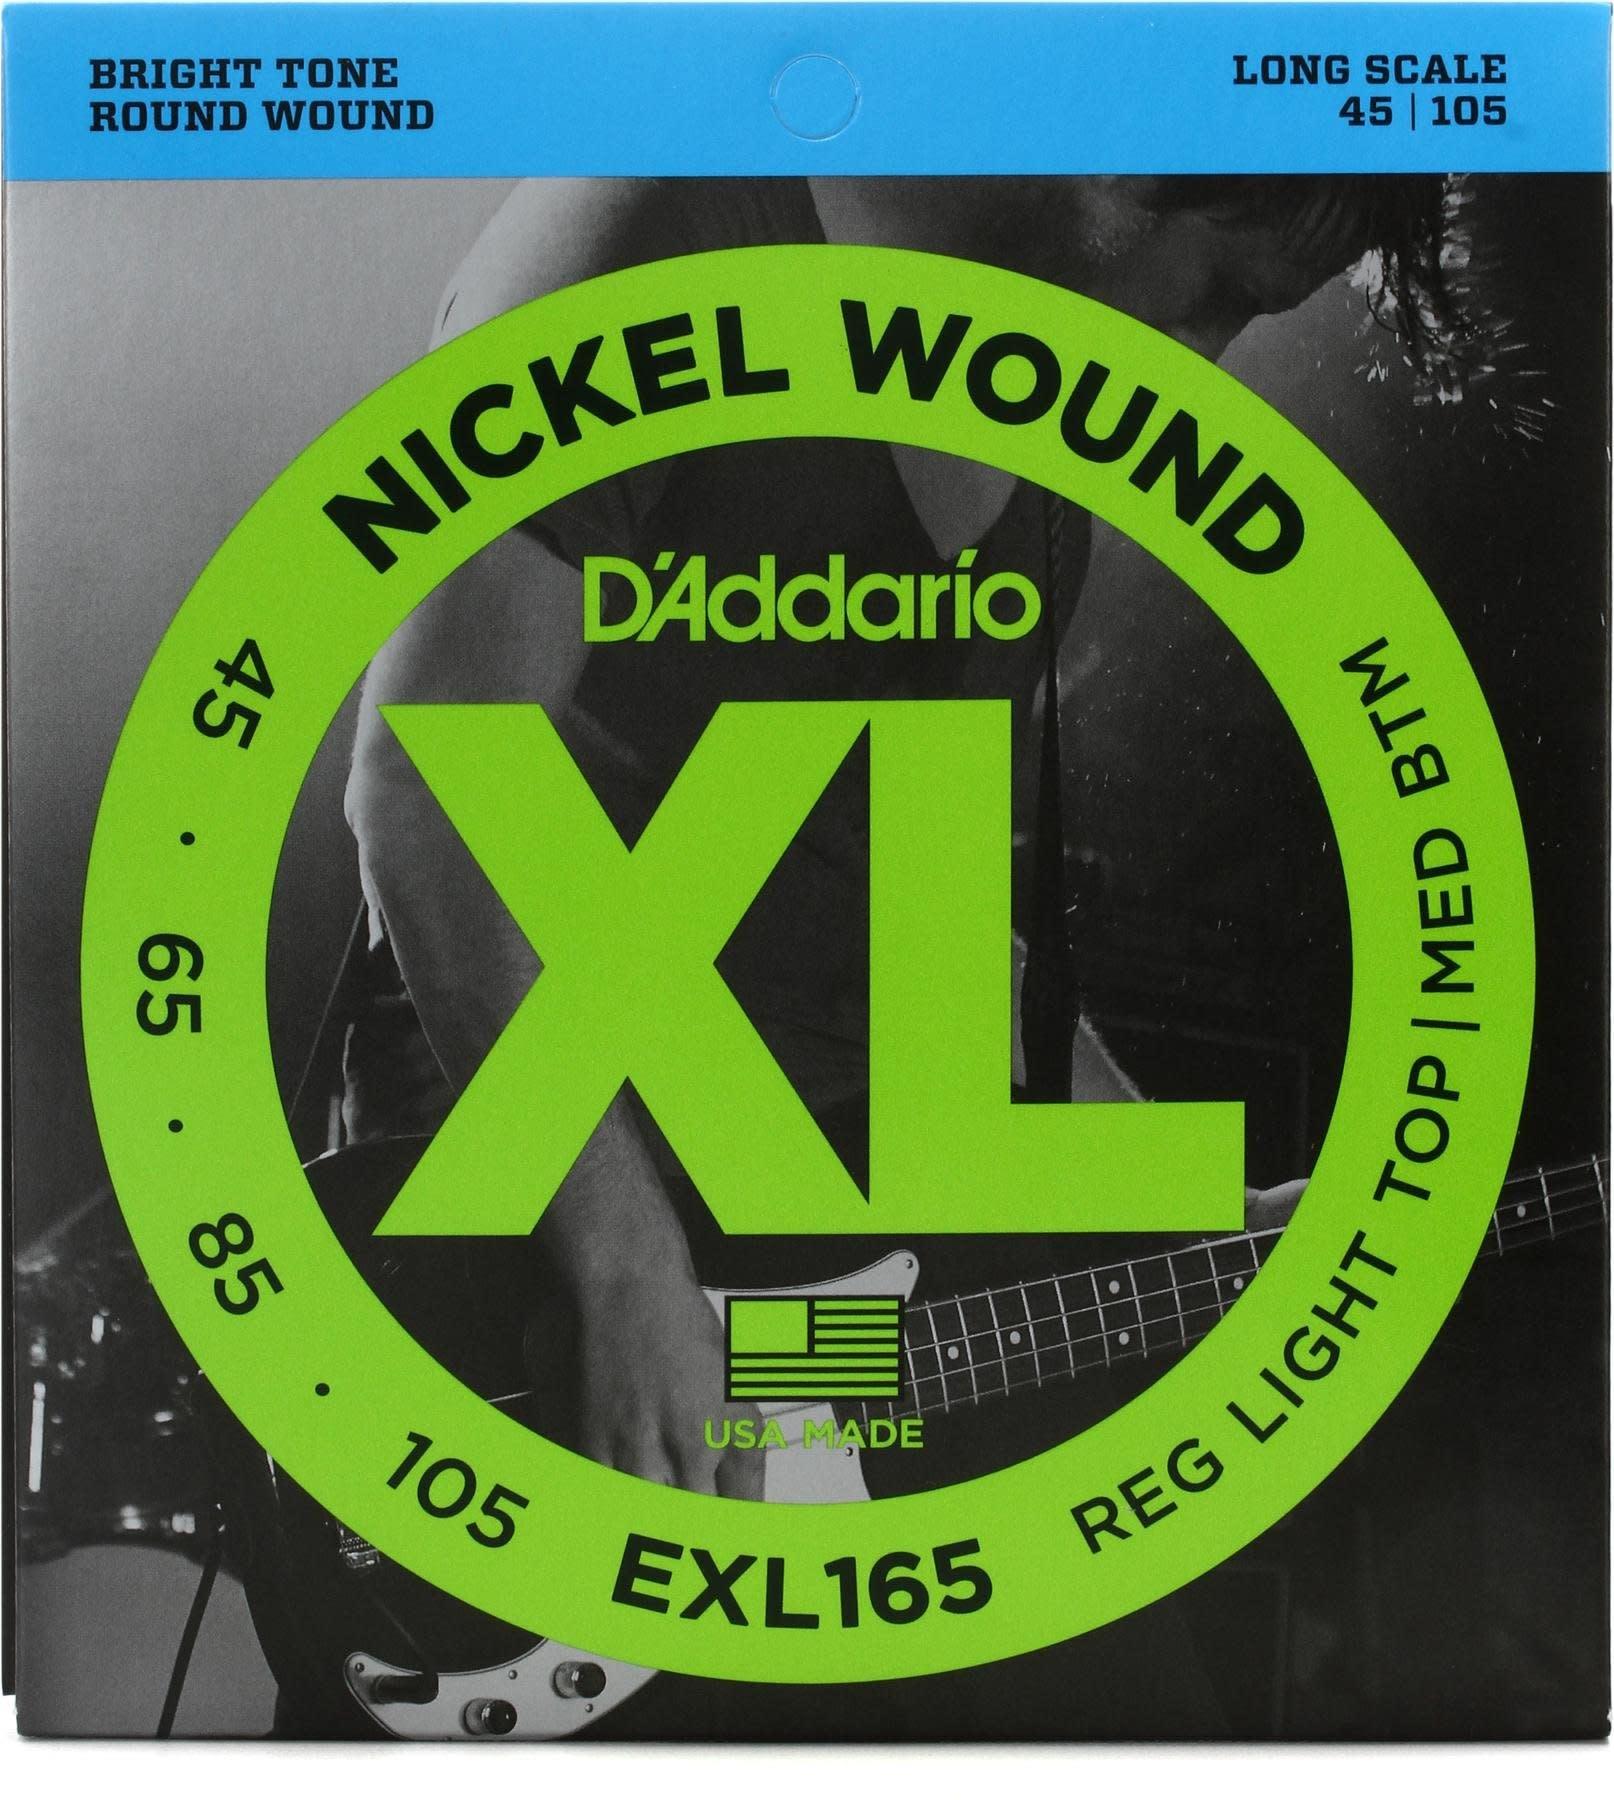 D'Addario EXL165 4-String Light Top Med Btm Long Scale 45-105